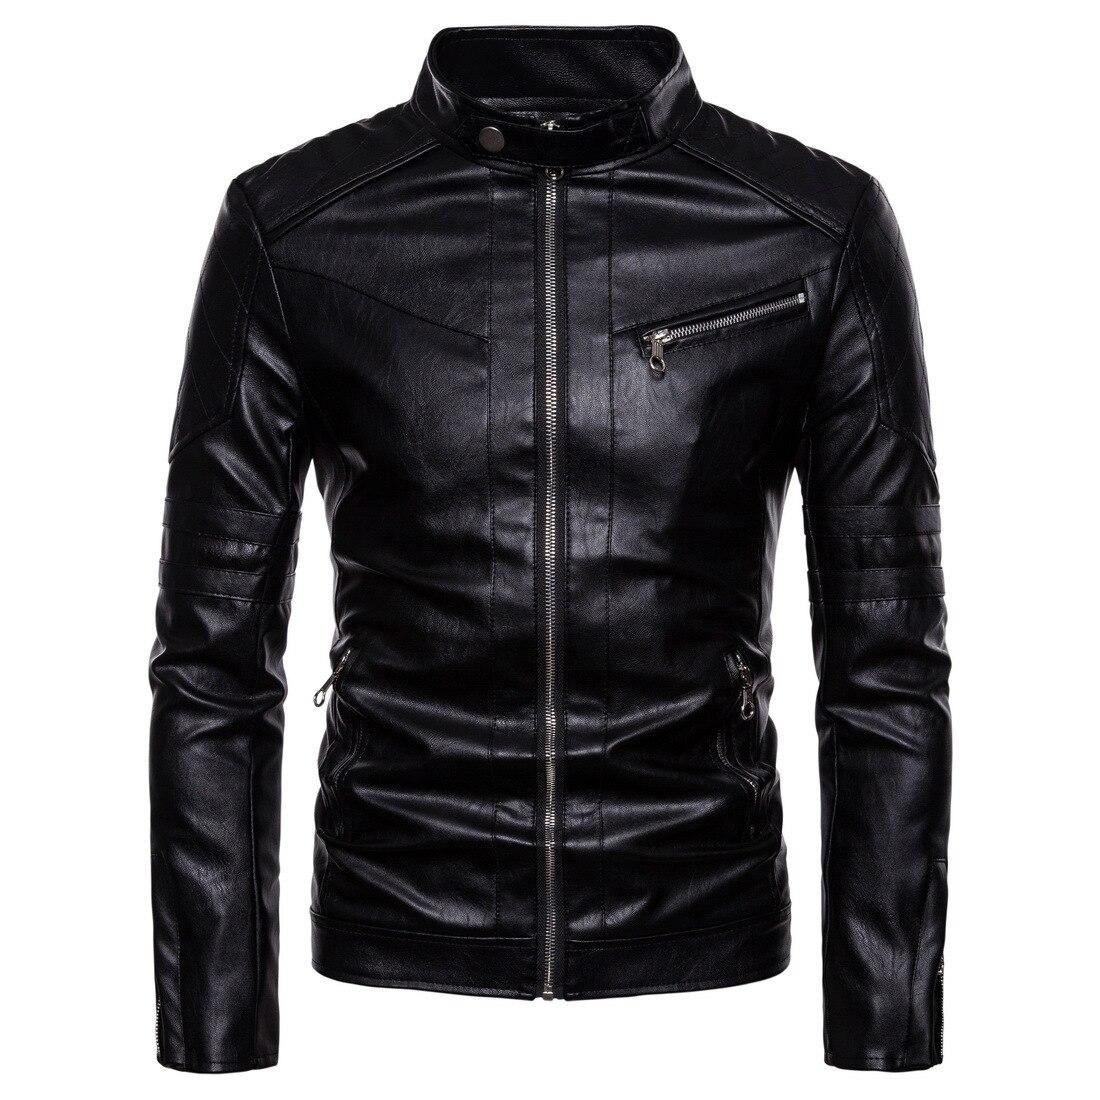 Men Leather Jackets and Coats Jacket Winter Faux Biker Motorcycle